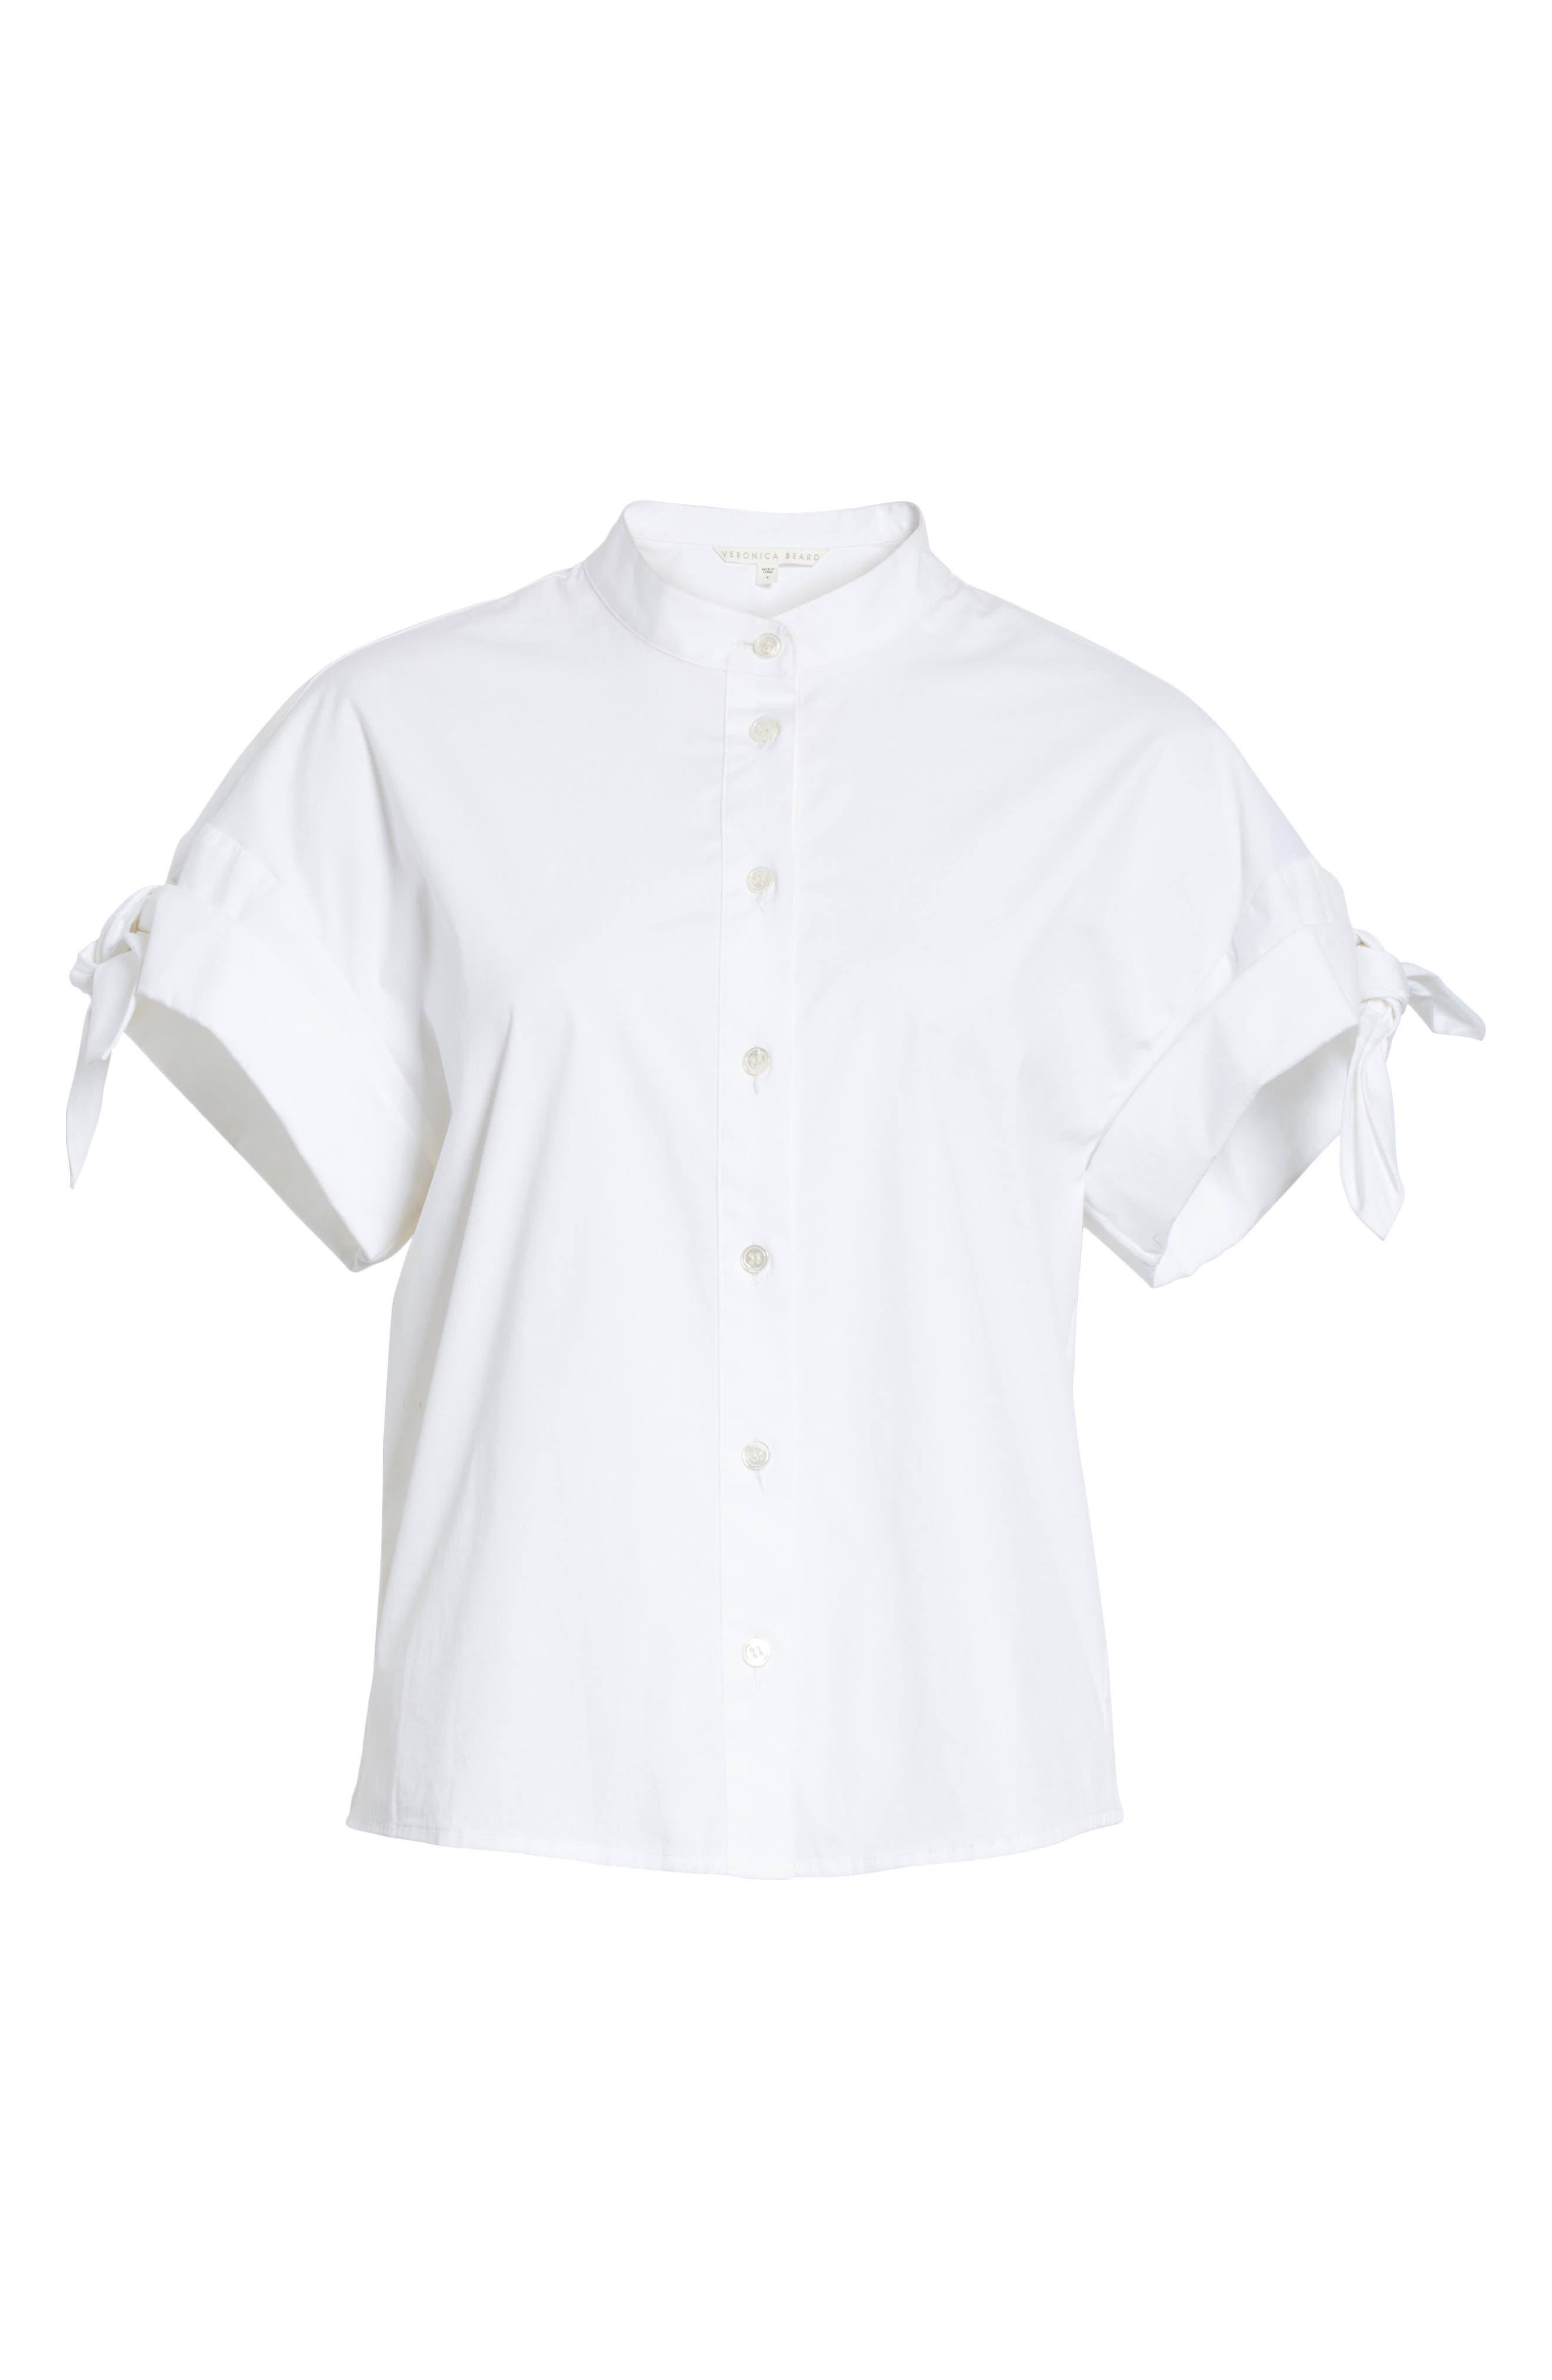 Sanaa Stretch Cotton Shirt,                             Alternate thumbnail 6, color,                             White